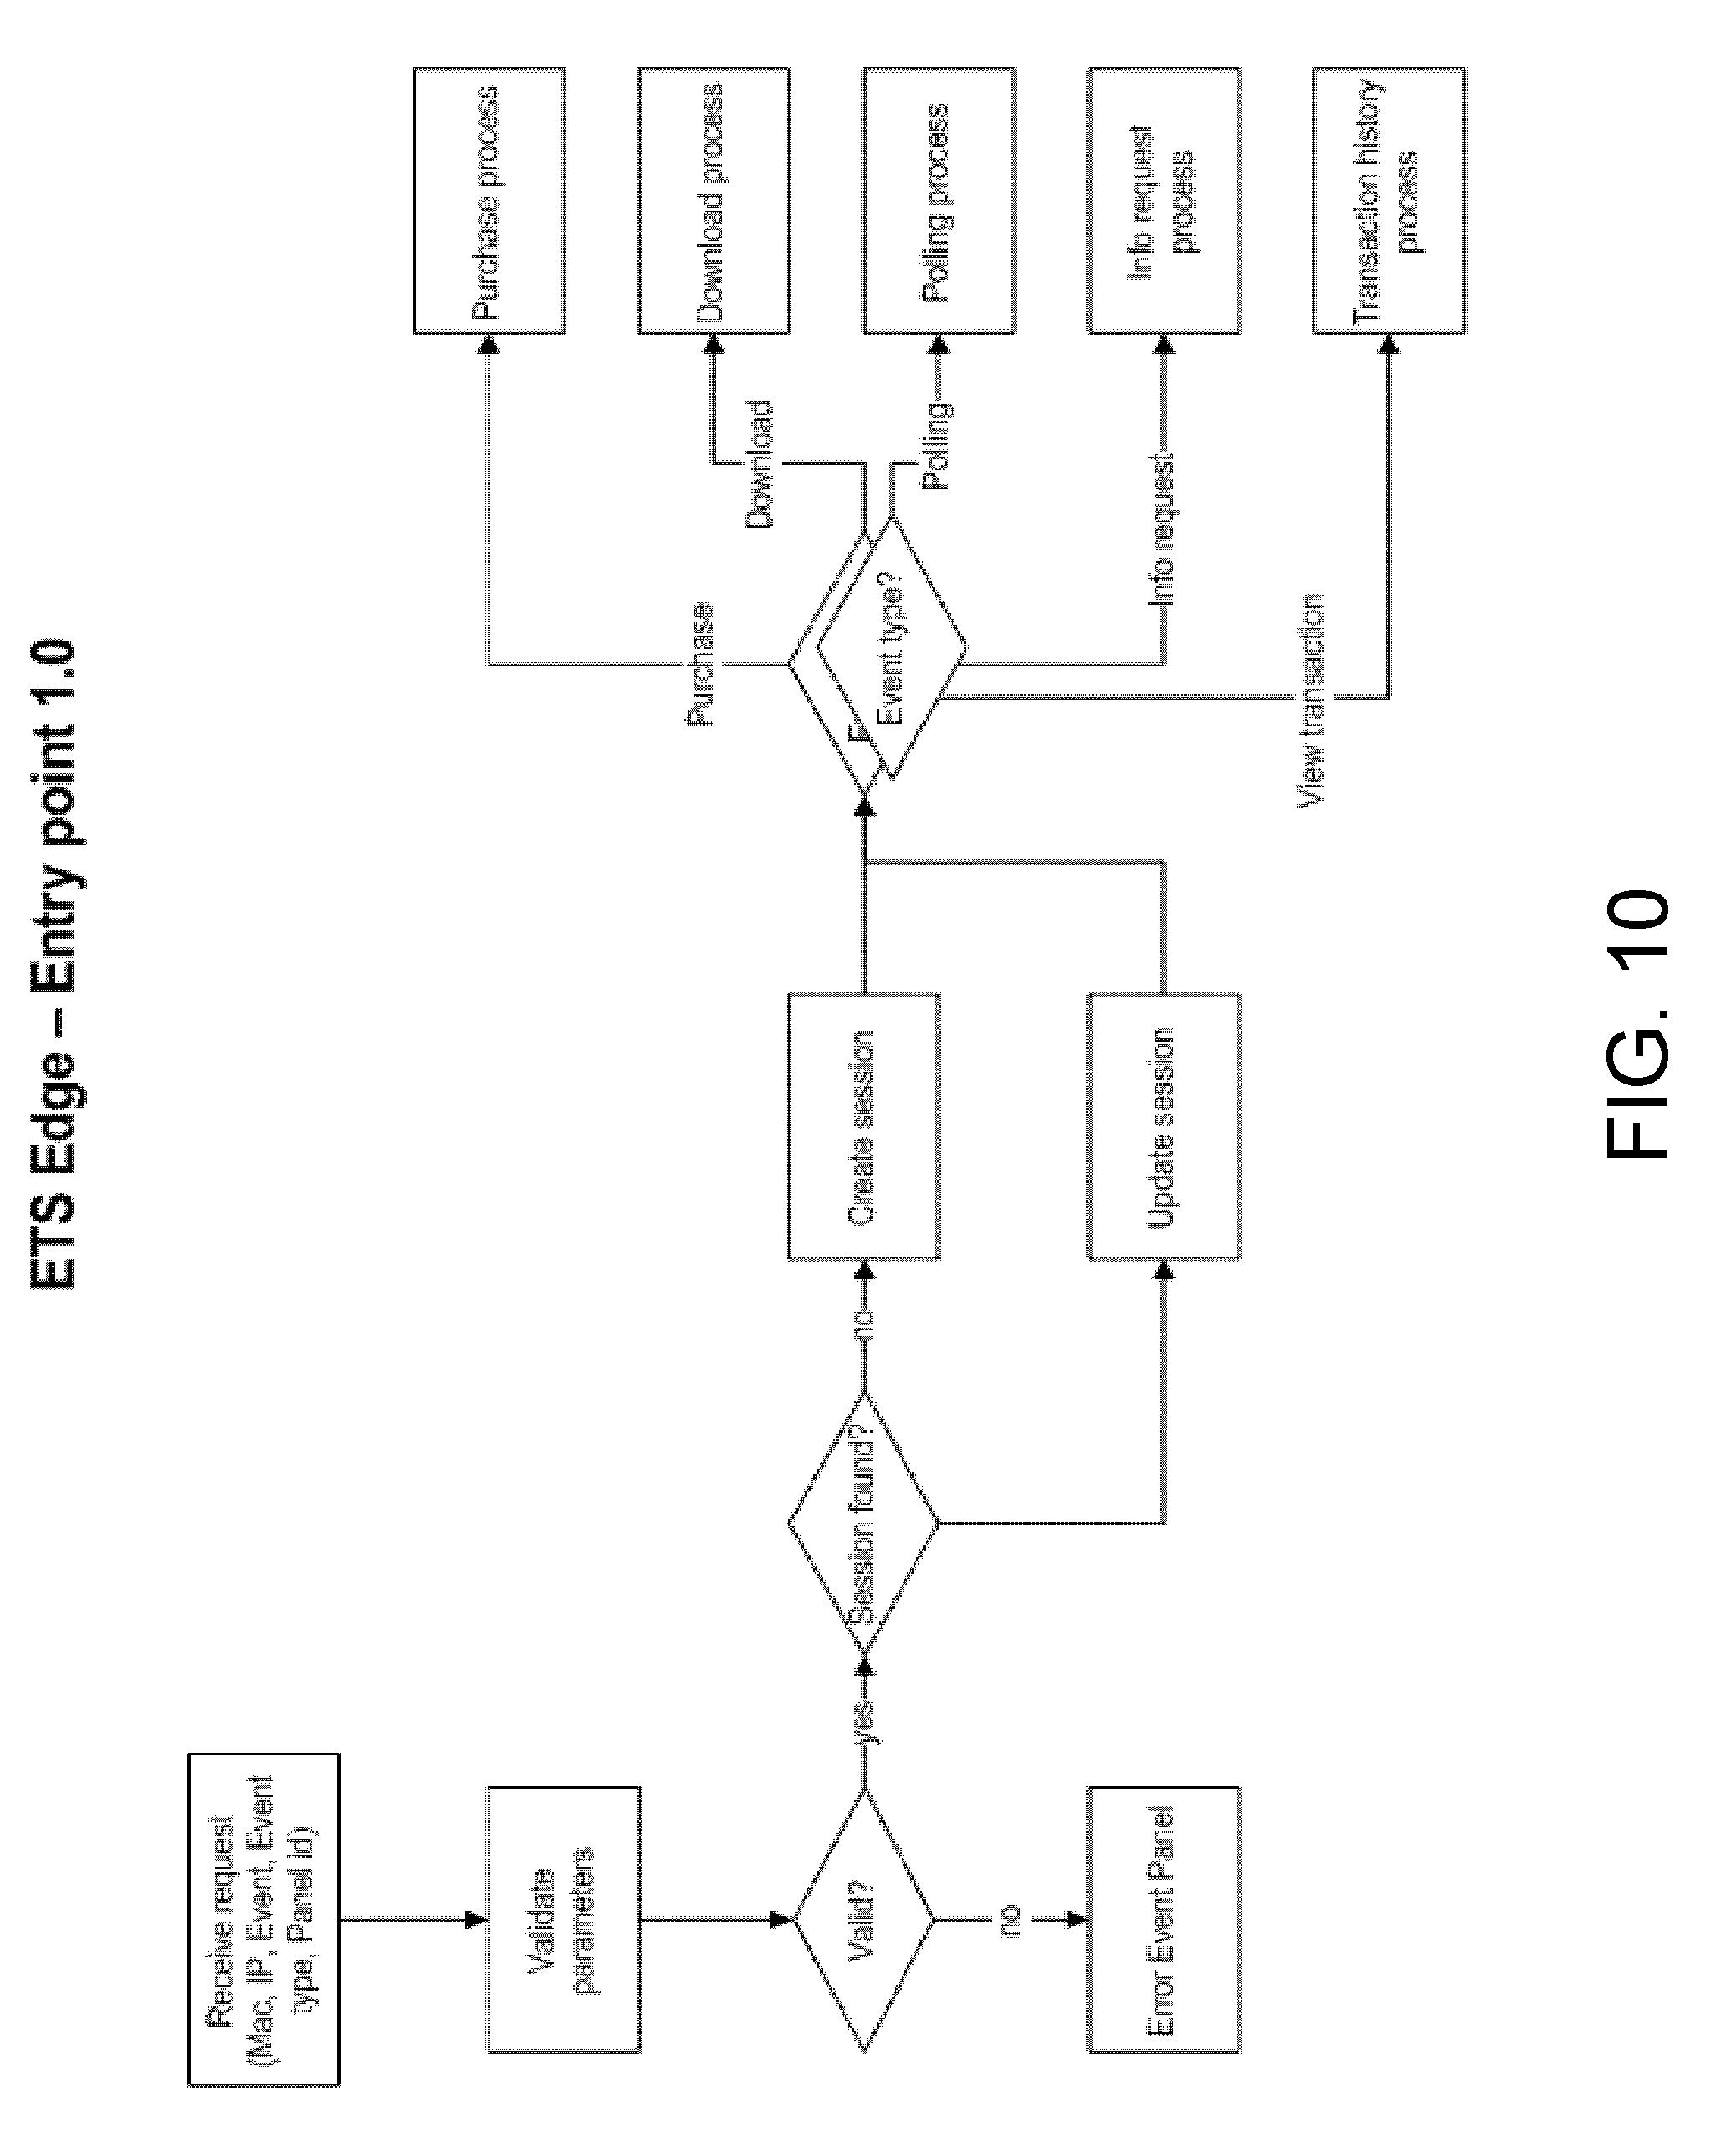 Regulated binary options broker in usa